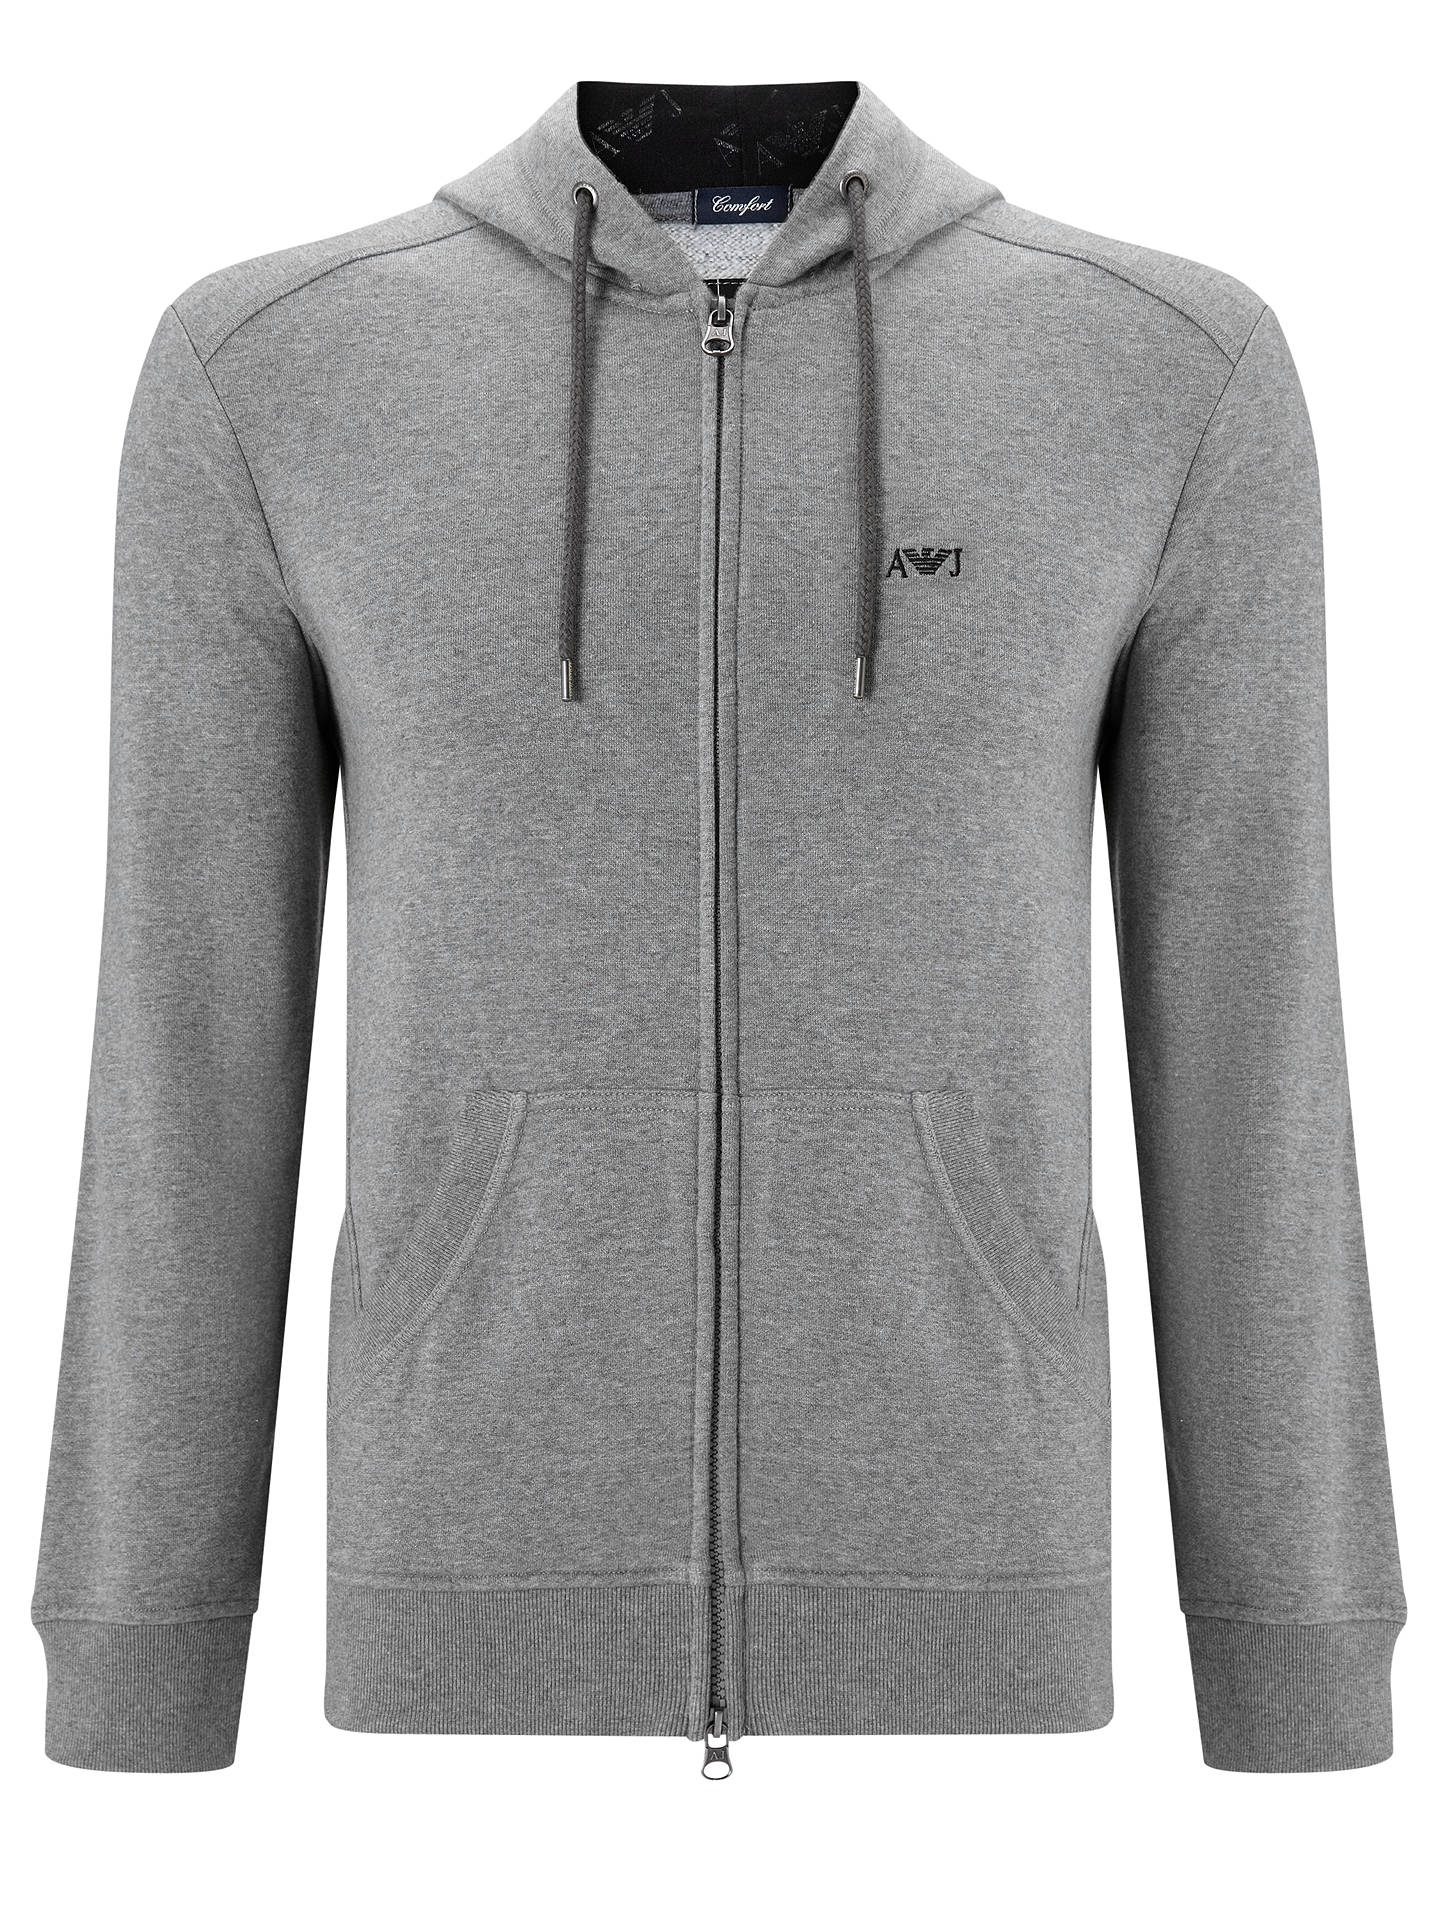 554367475f76 Buy Armani Jeans Small Logo Zip Hoodie